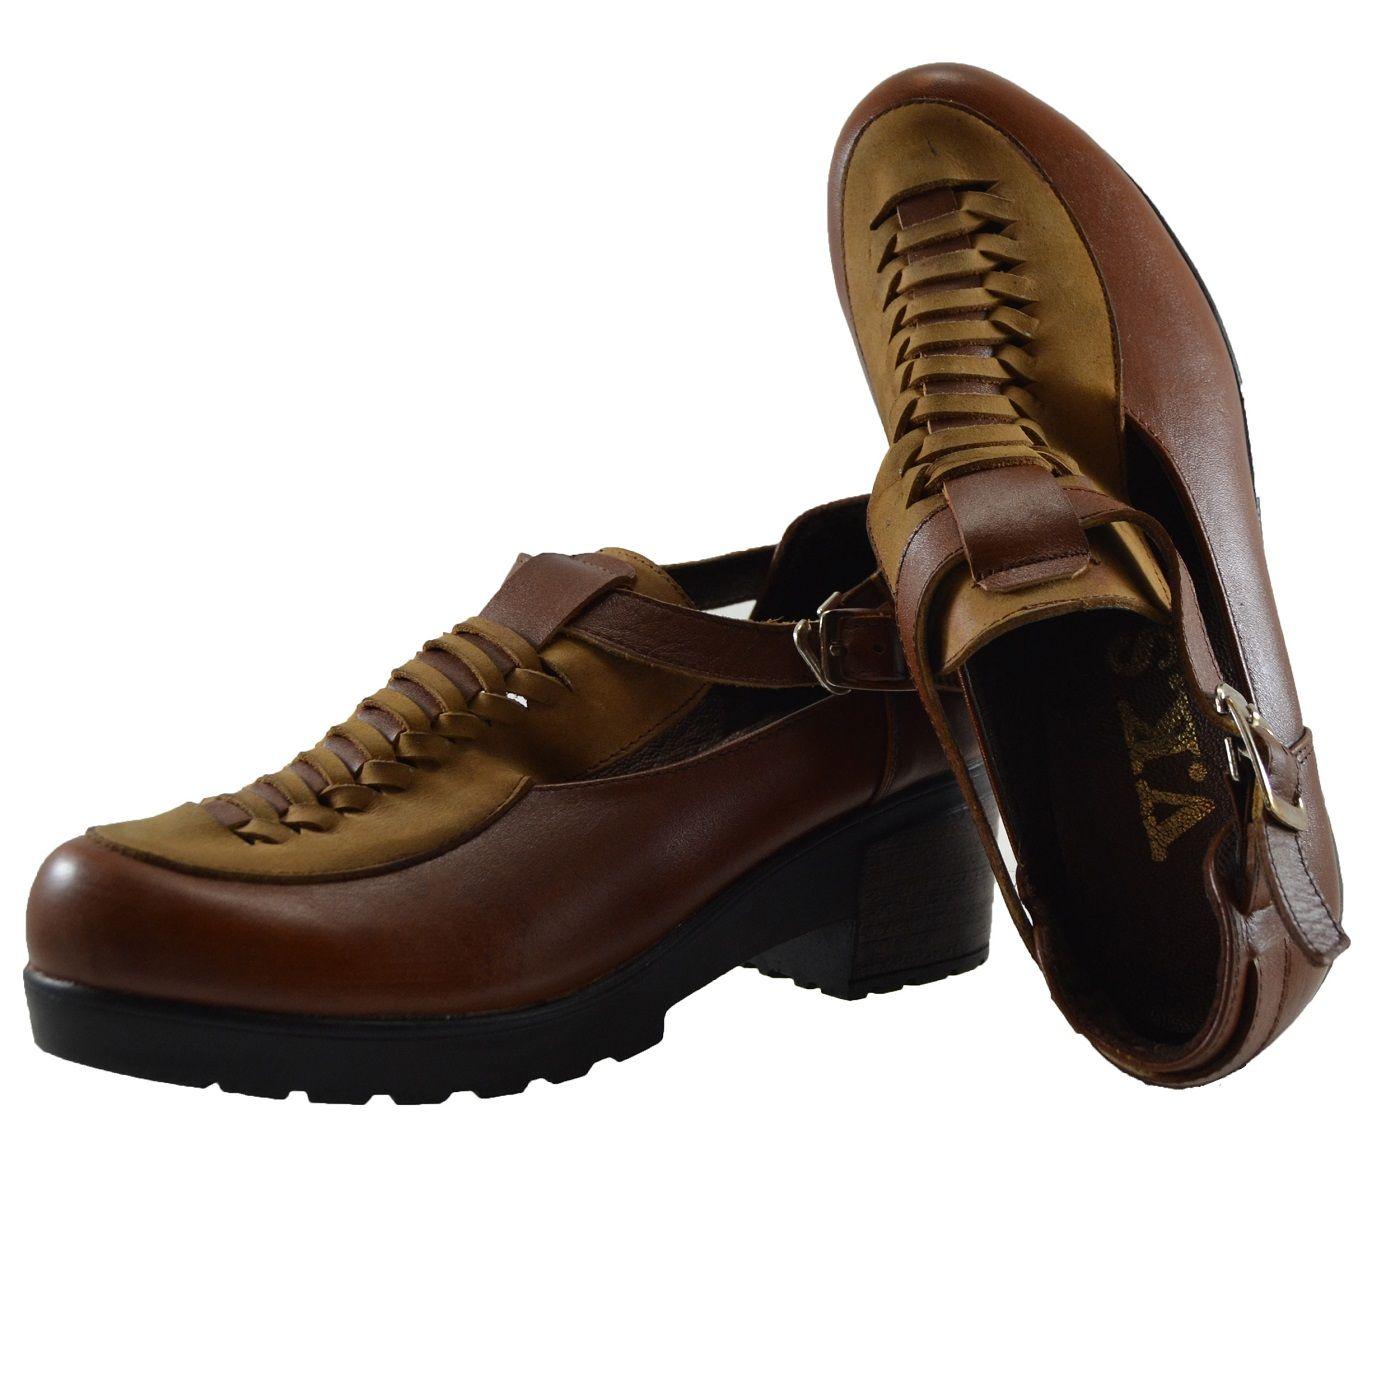 کفش زنانه کد 461 -  - 3